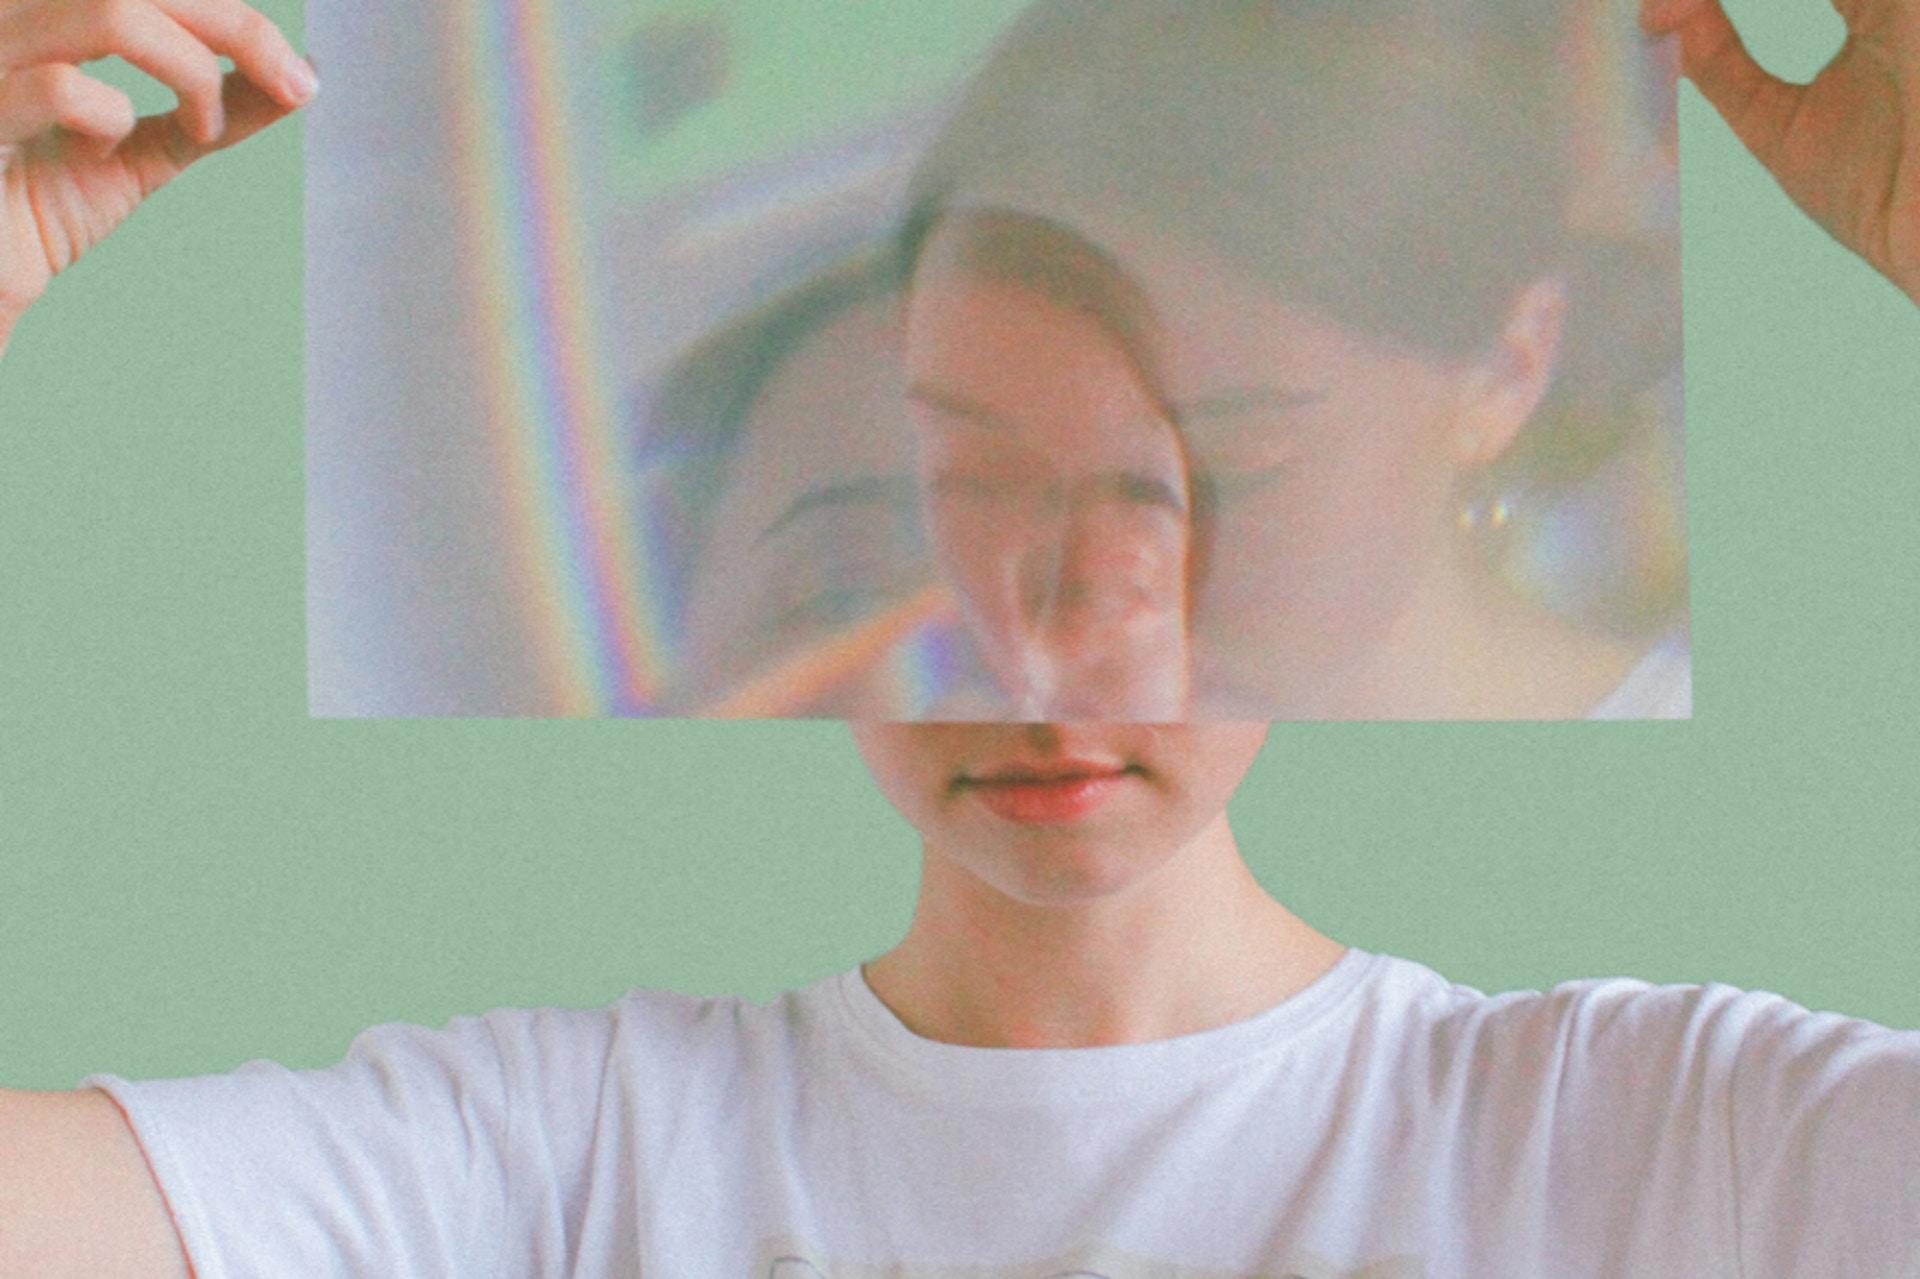 Frau hält Folie vor ihr Gesicht, das verzerrt